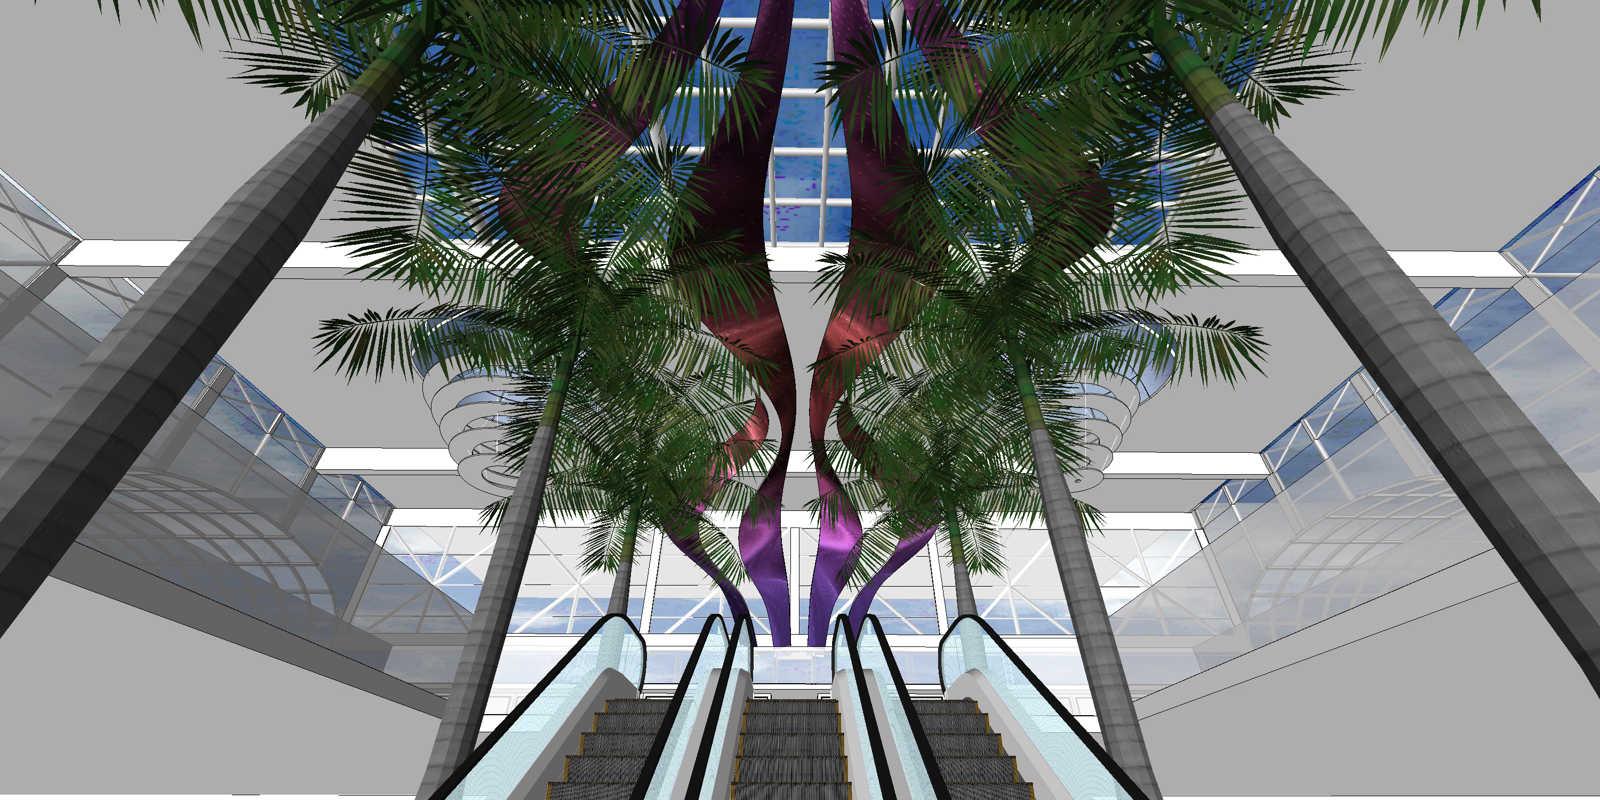 conception-CAO-flexible-LED-display-screen-Nevada-Shopping-mall-Granada